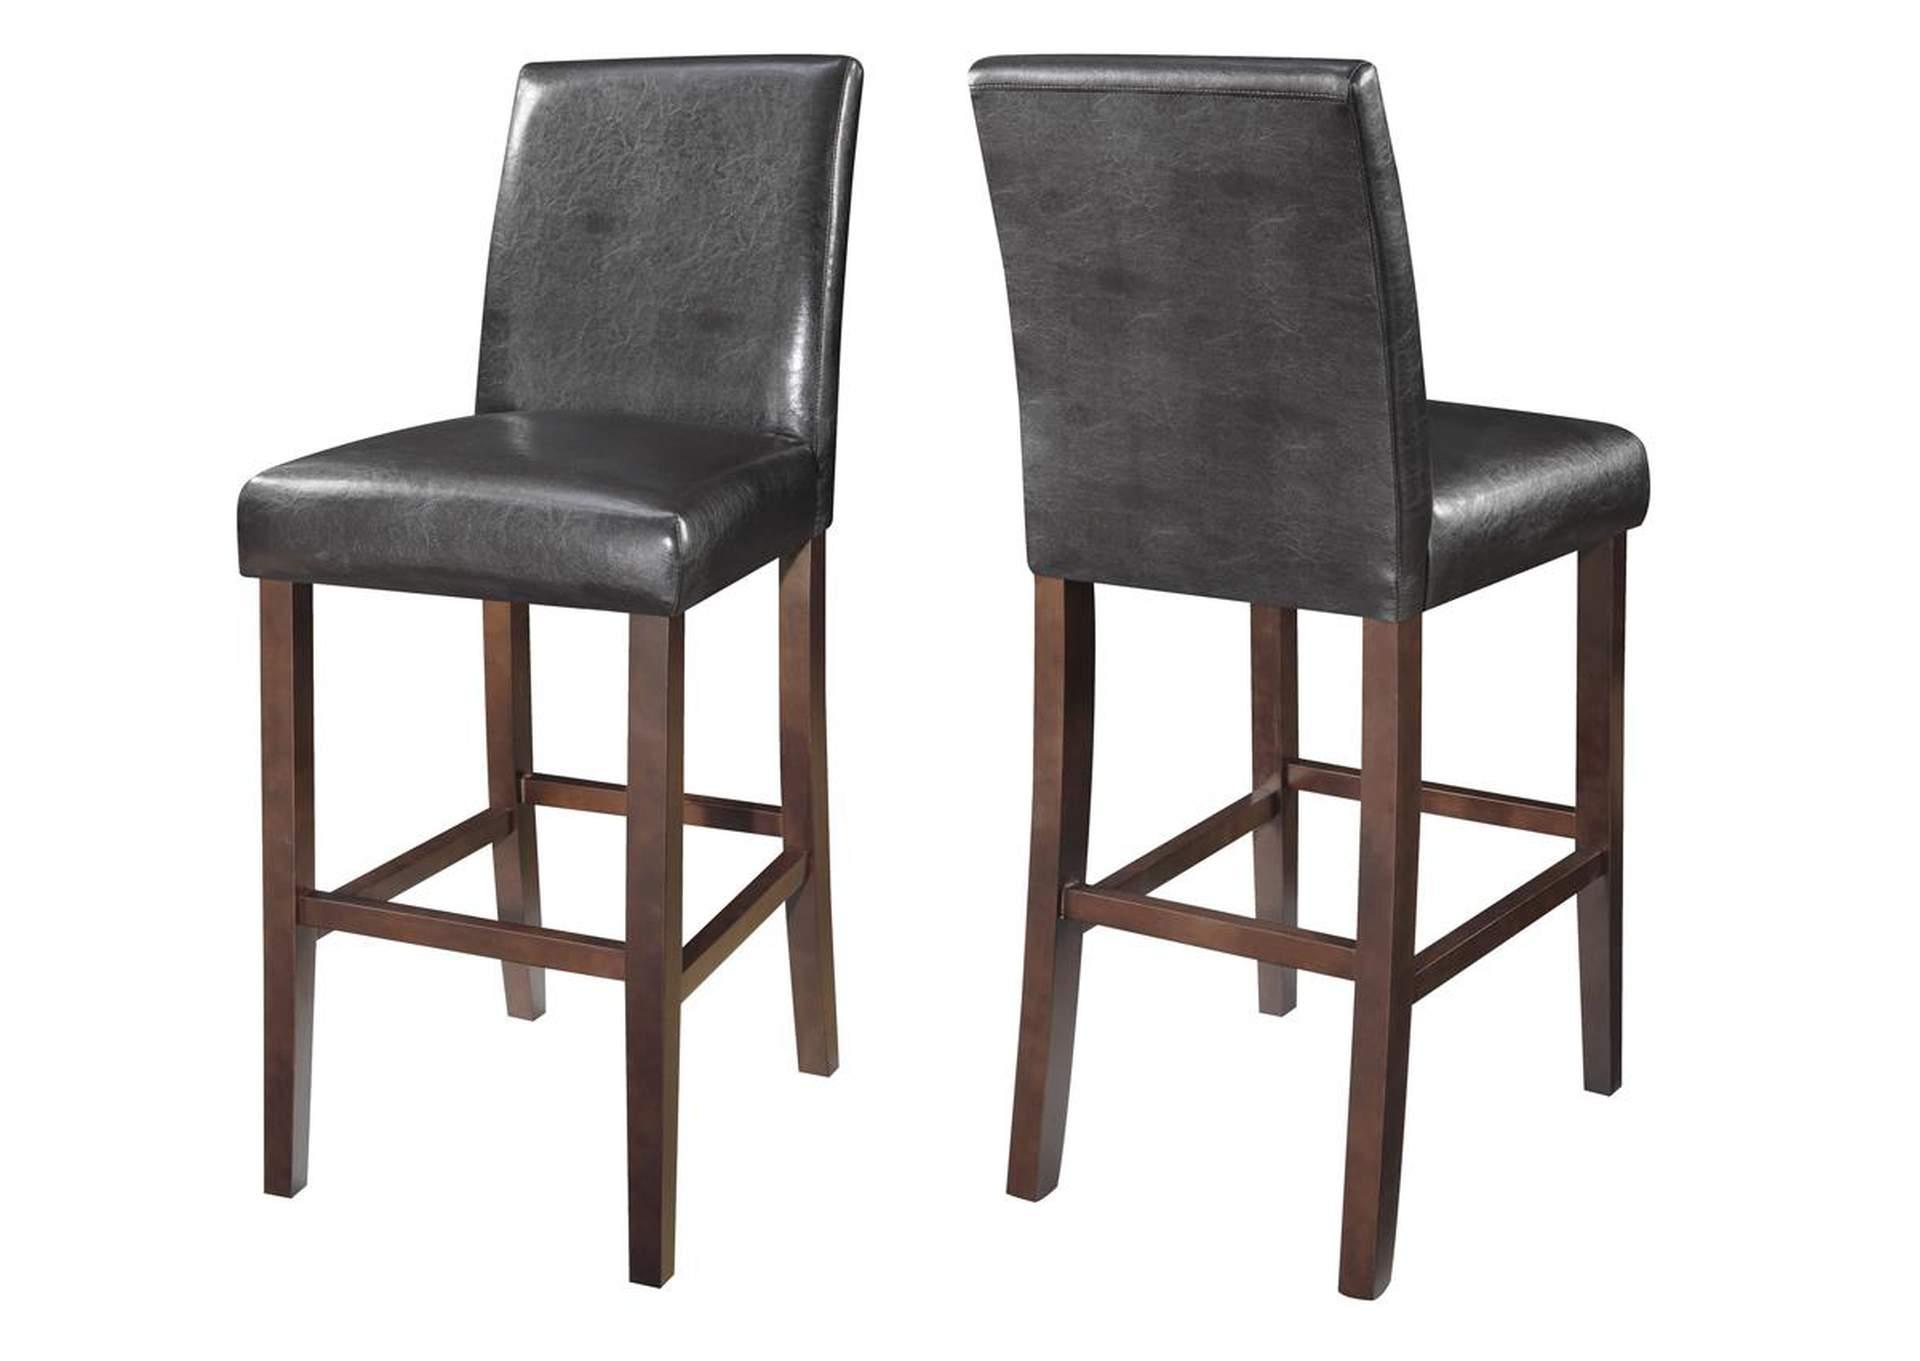 Brilliant Overstock Furniture Langley Park Catonsville Alexandria Beatyapartments Chair Design Images Beatyapartmentscom